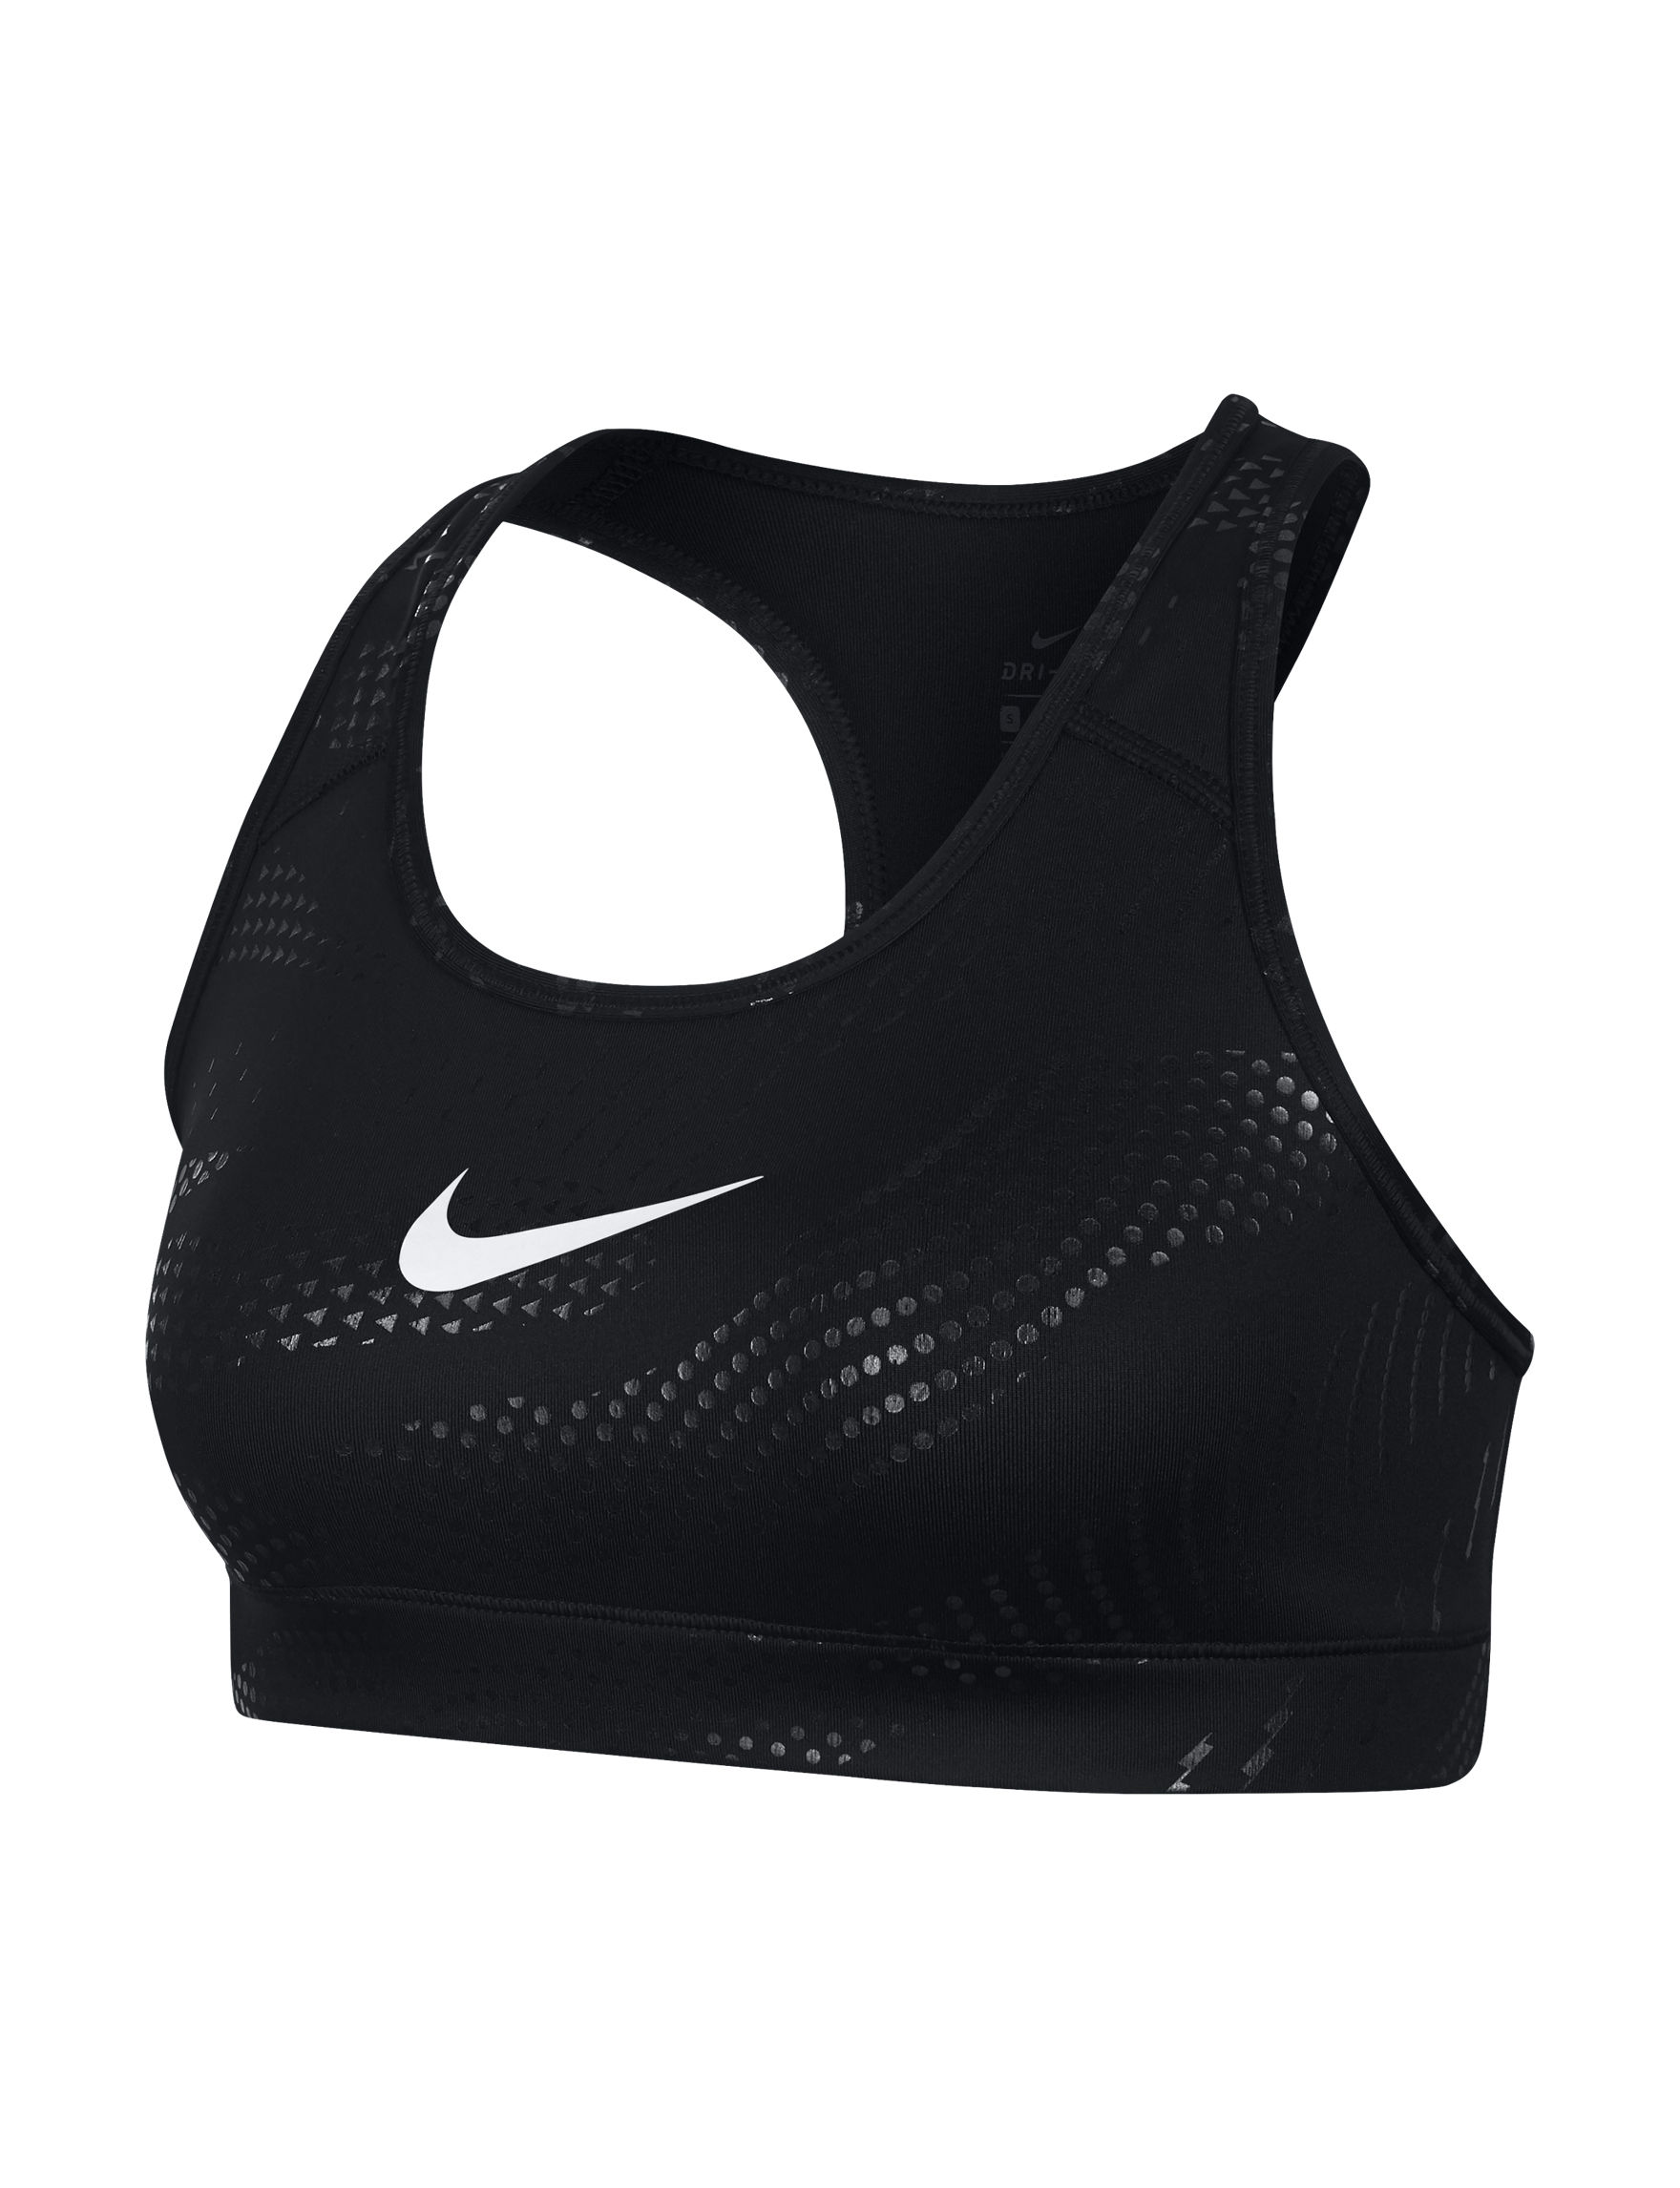 Nike Black Bras Sports Bra